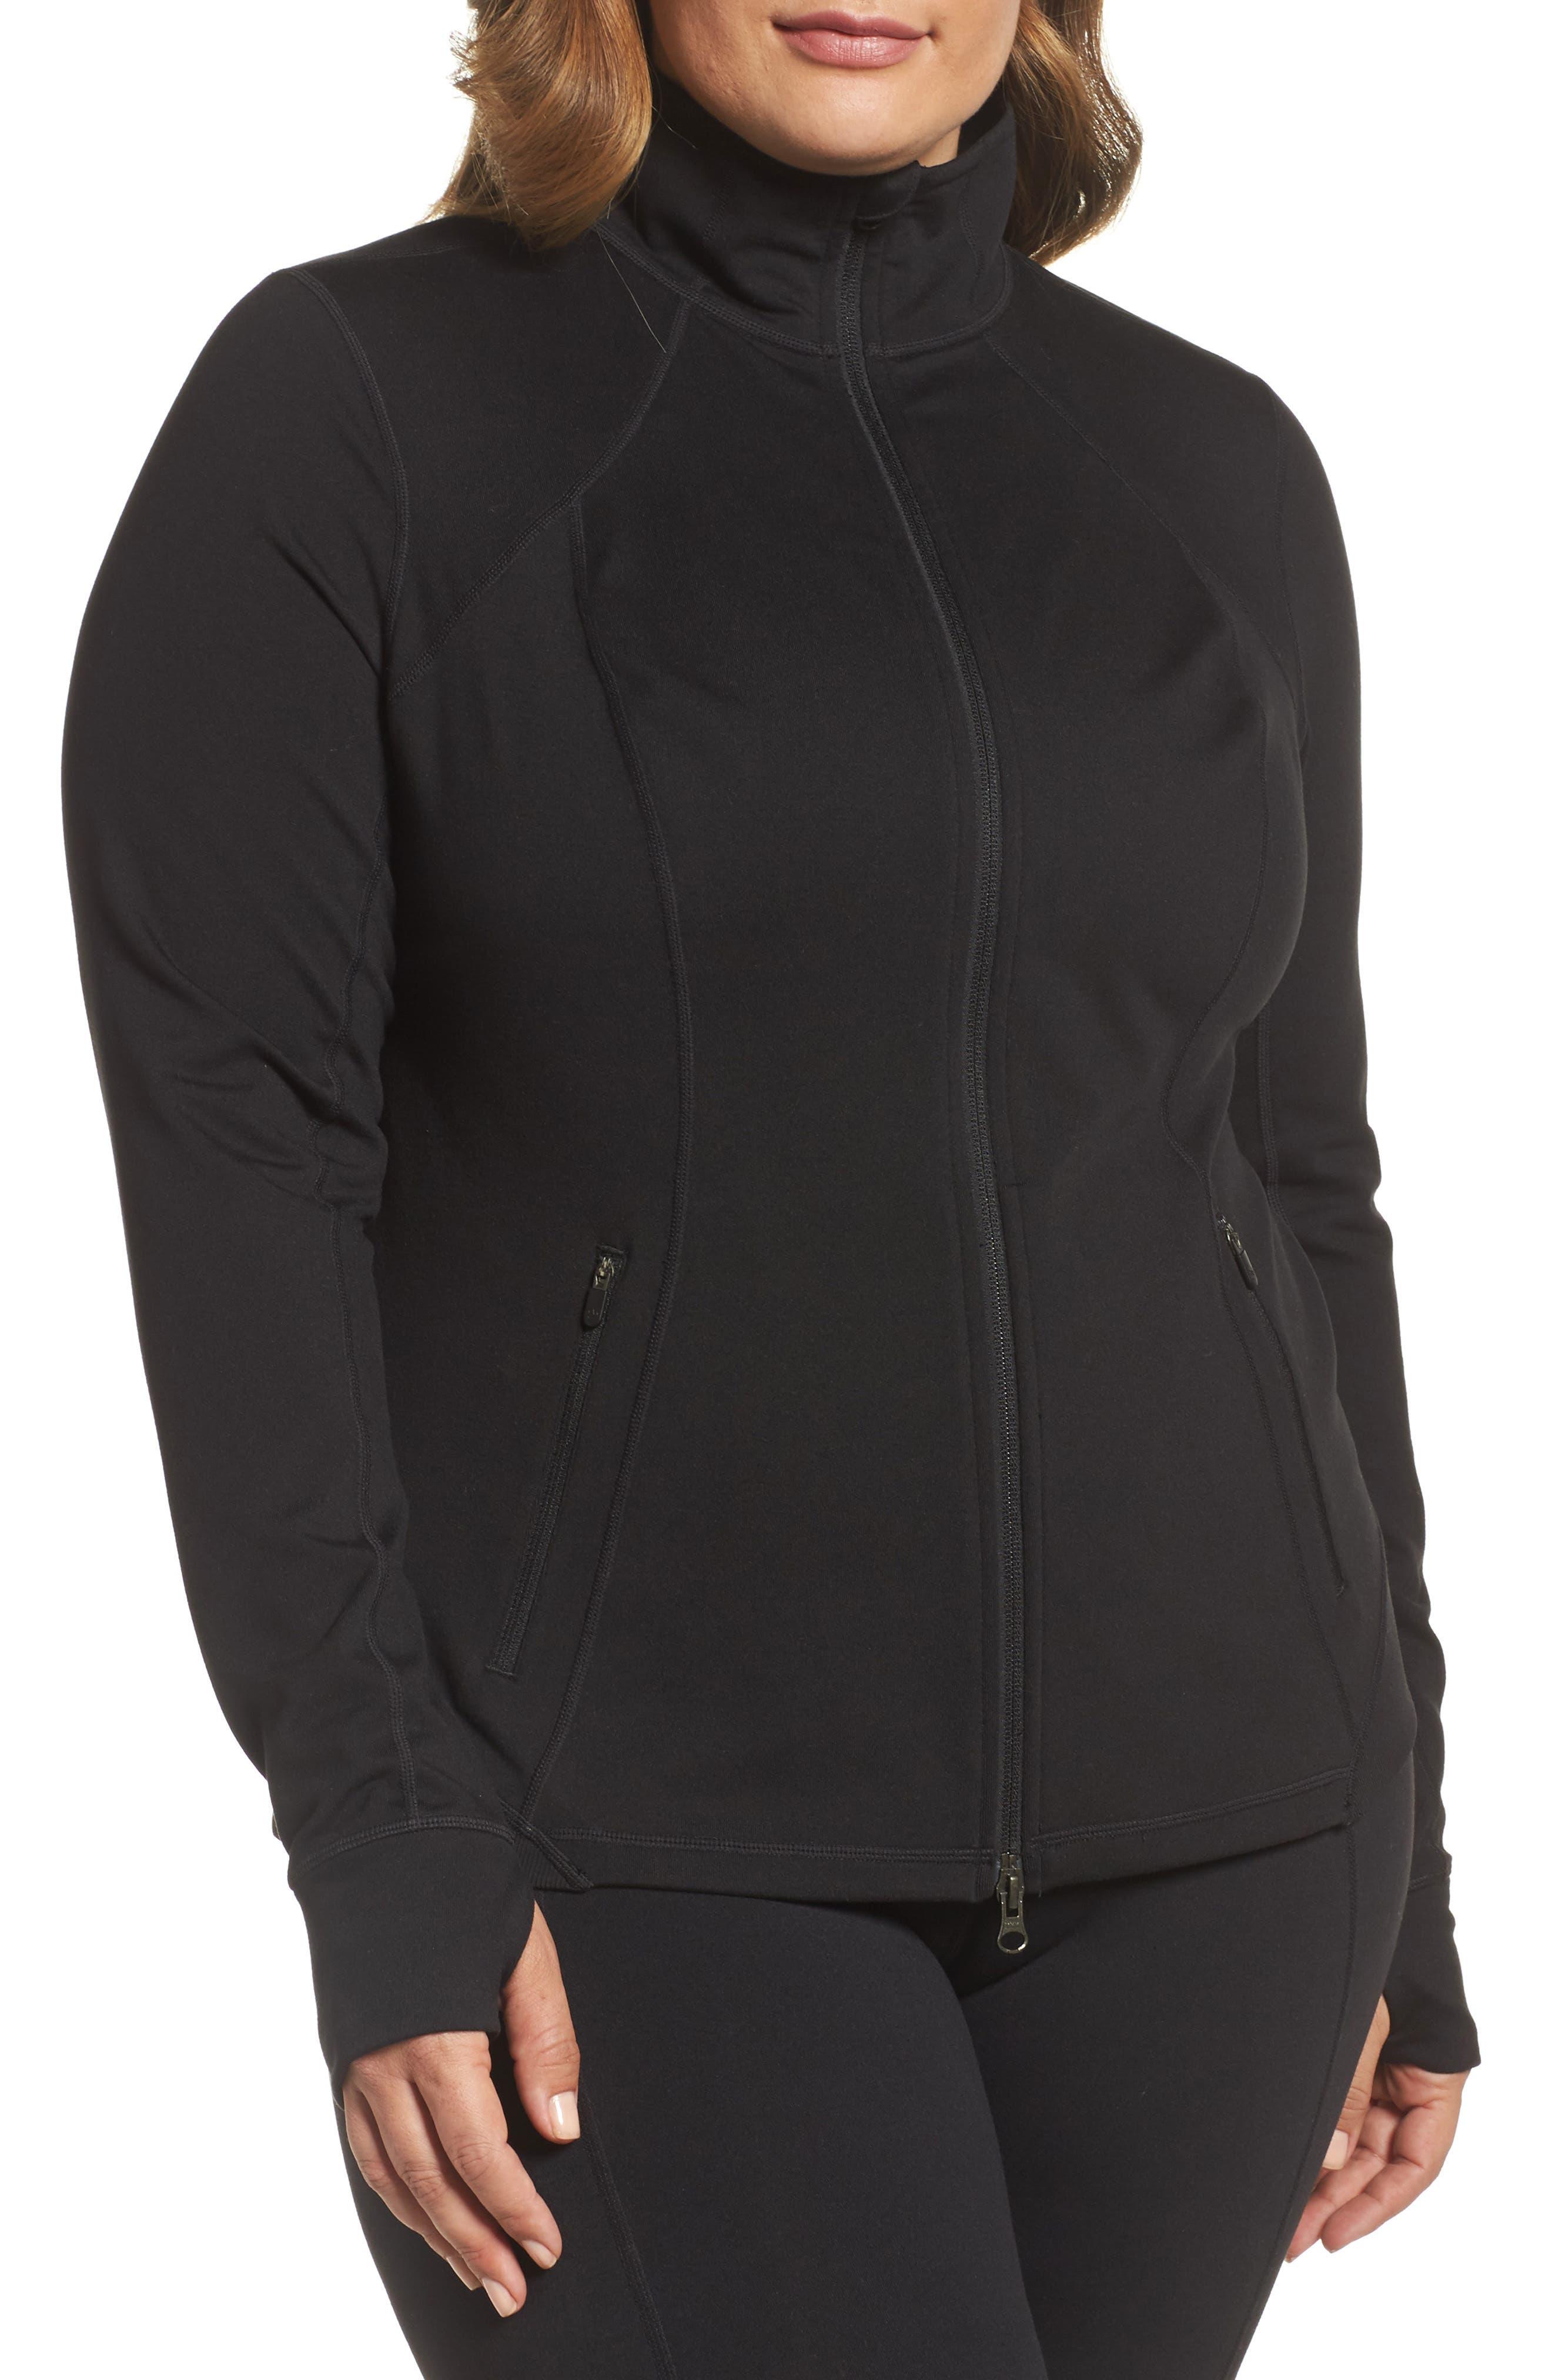 Zella Presence Jacket (Plus Size)